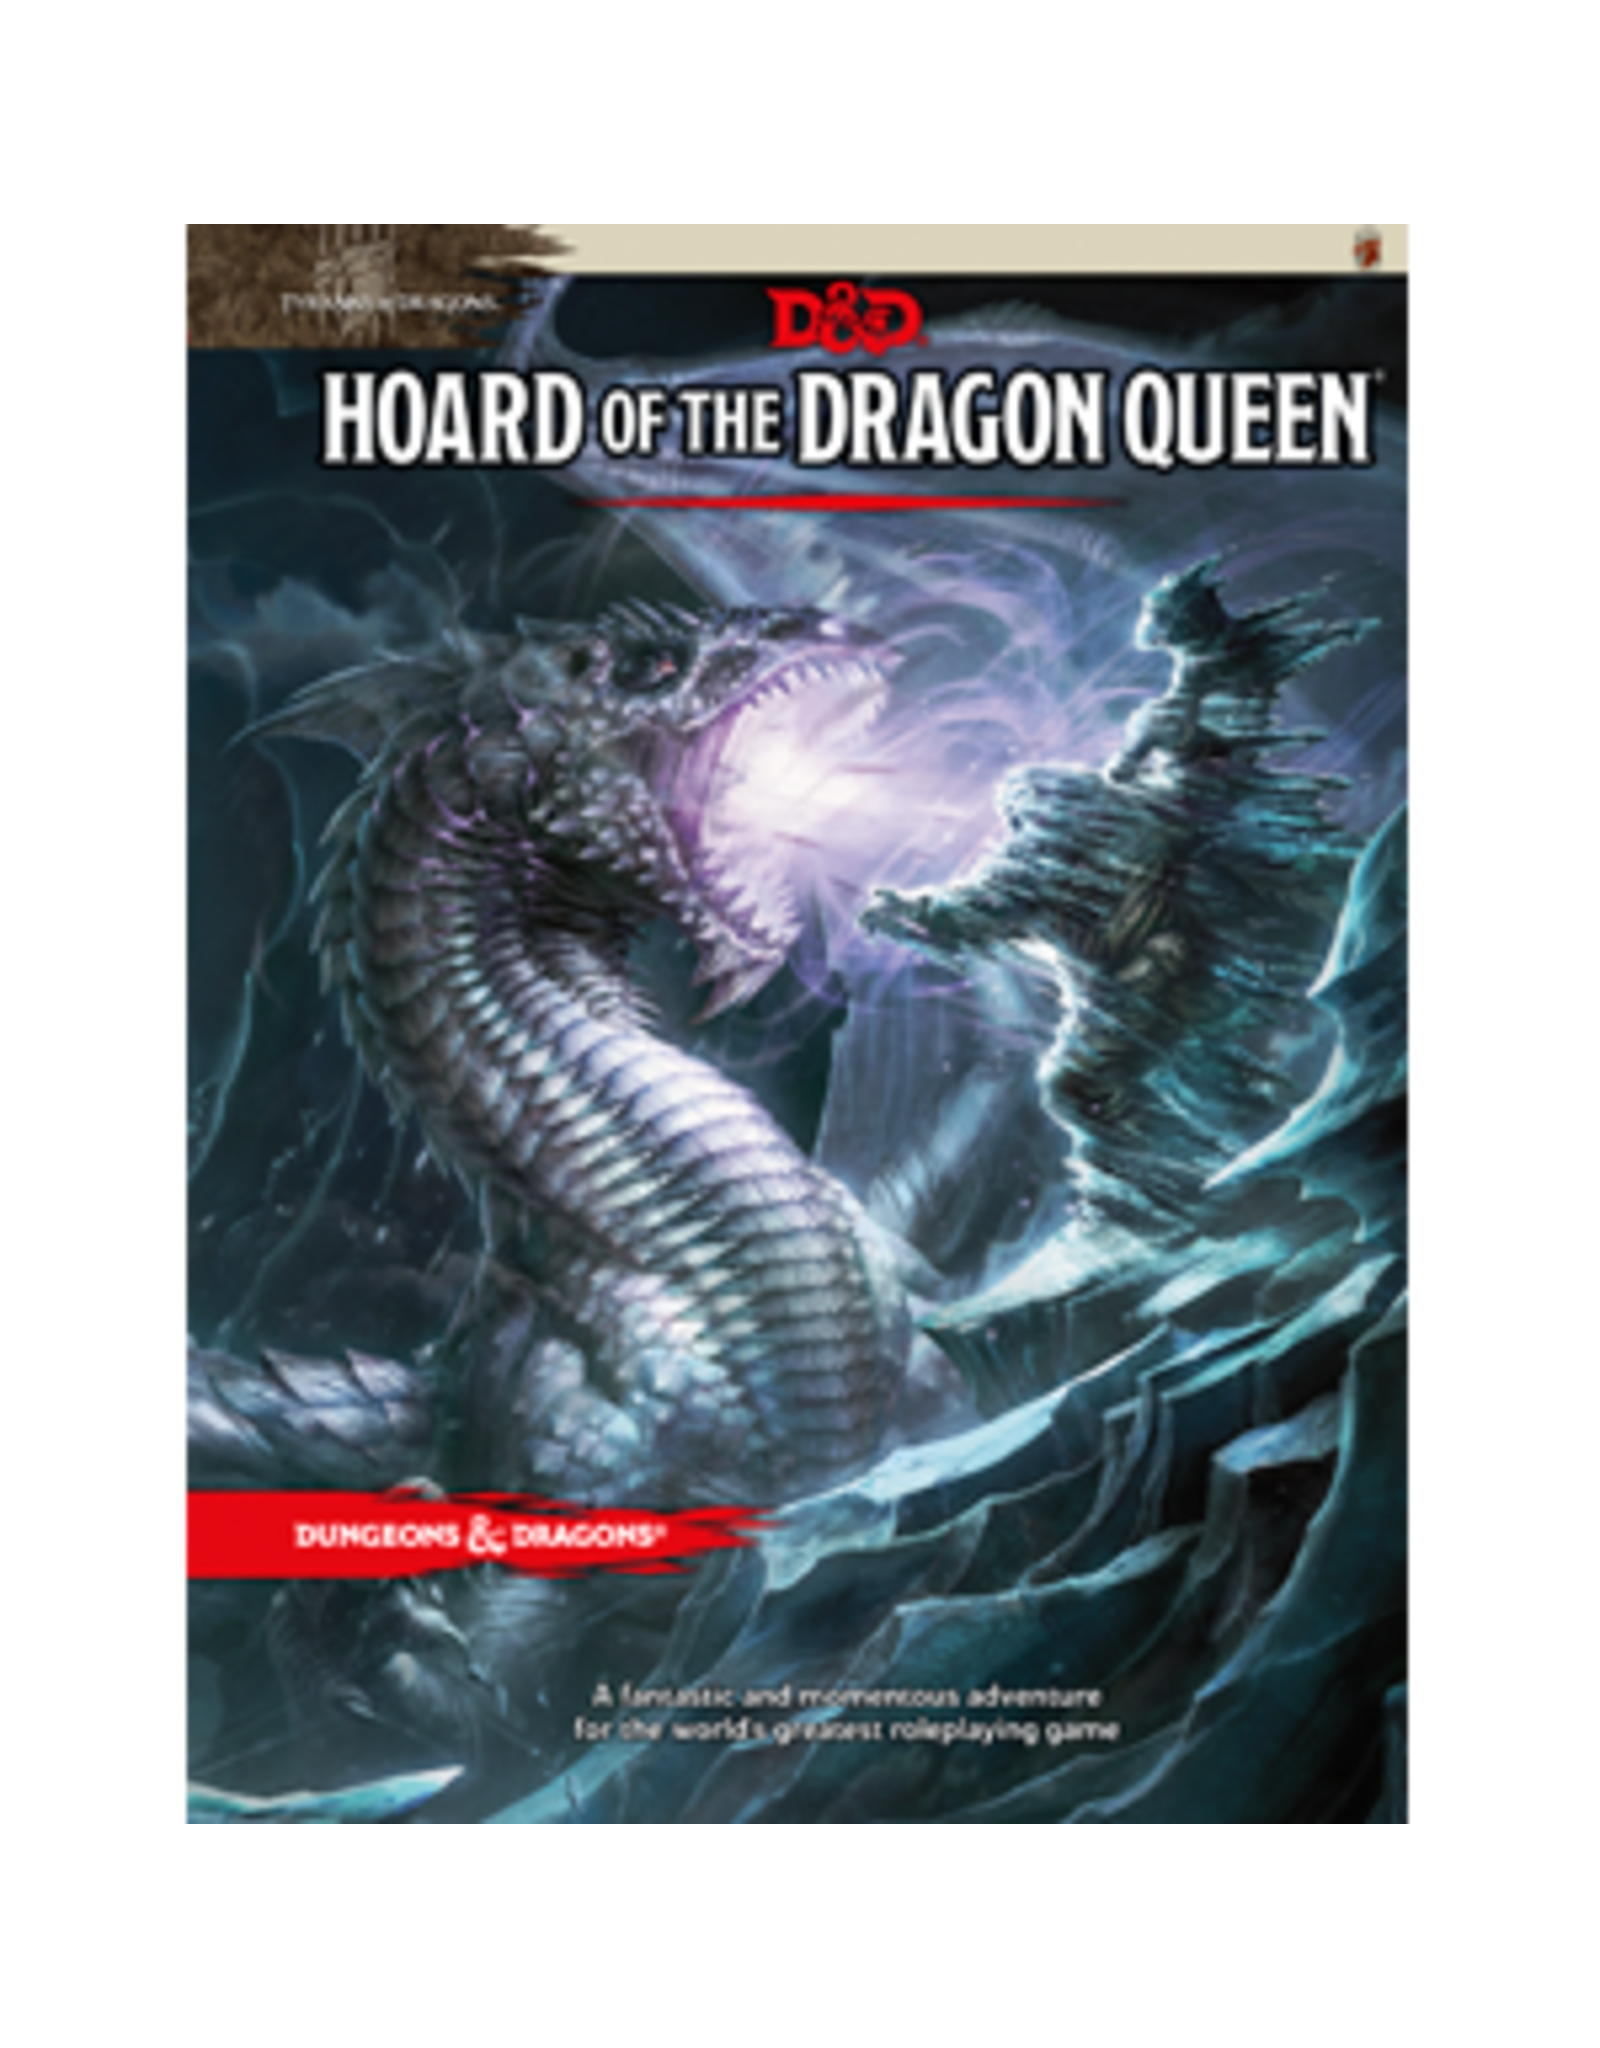 D&D: Hoard of the Dragon Queen